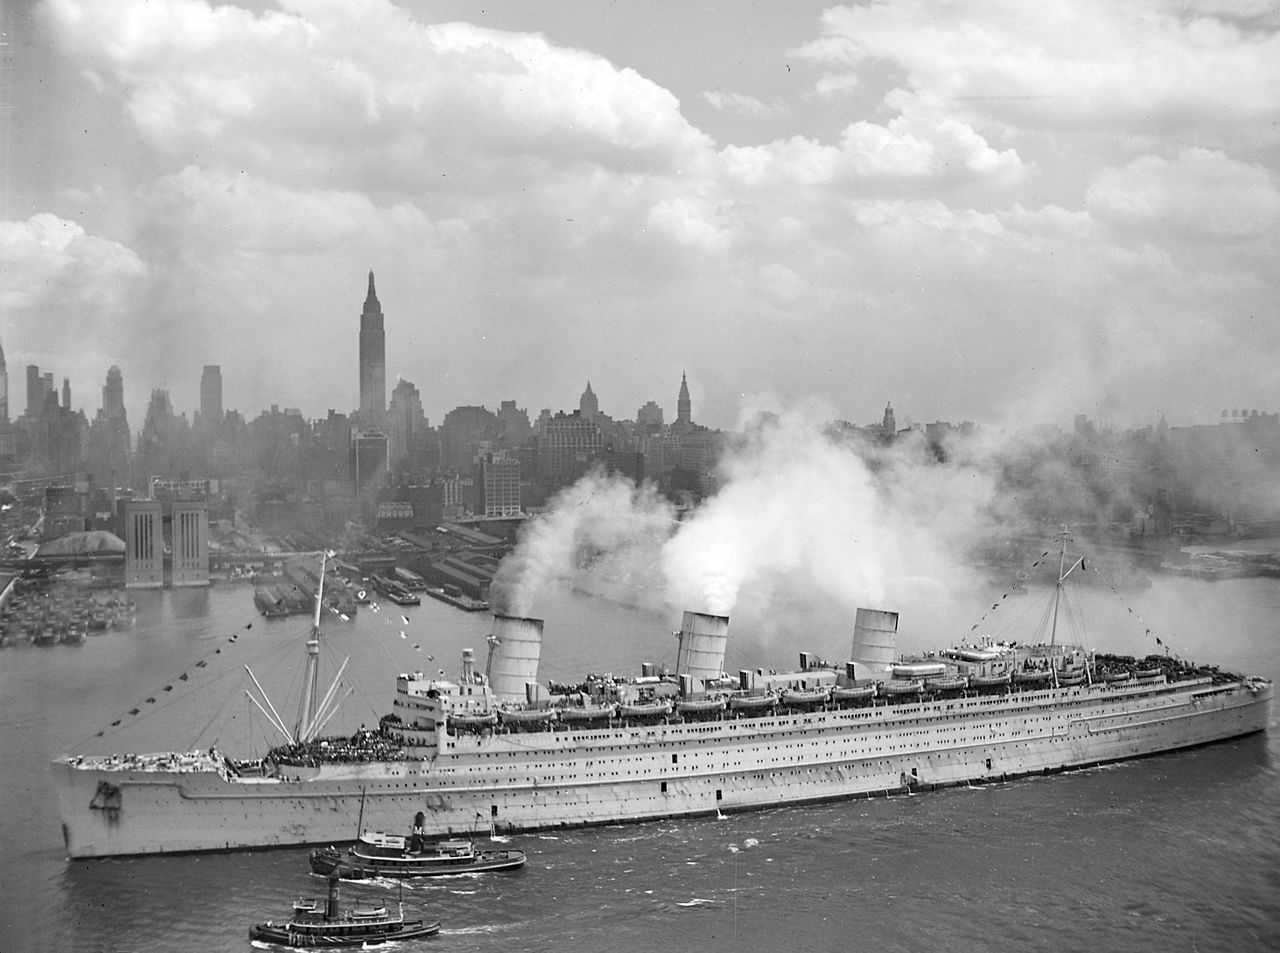 RMS Queen Mary - Podróż w wielkim stylu by LONG STORY SHORT